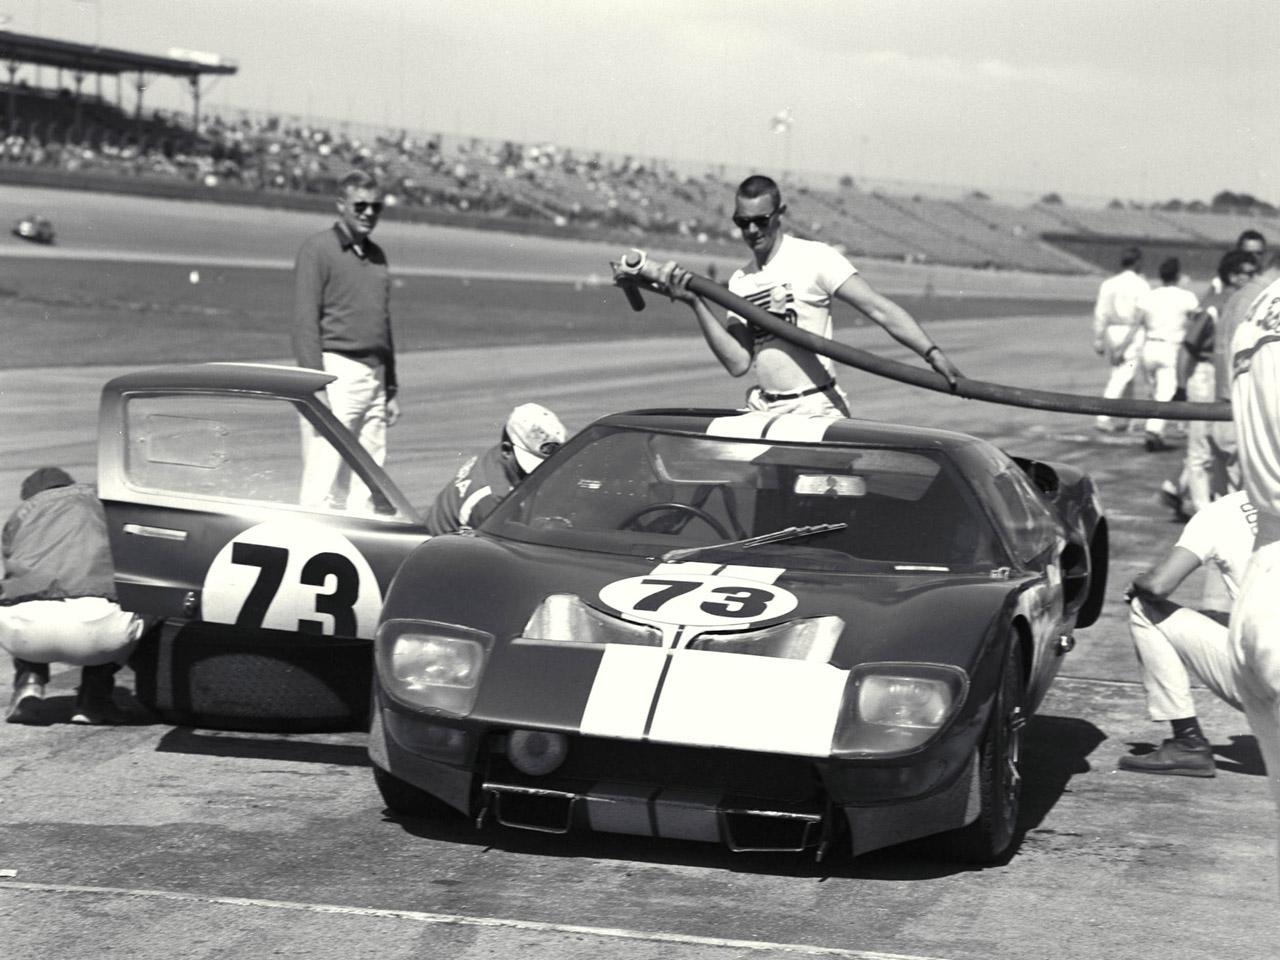 Ford GT 1965 foto - 4